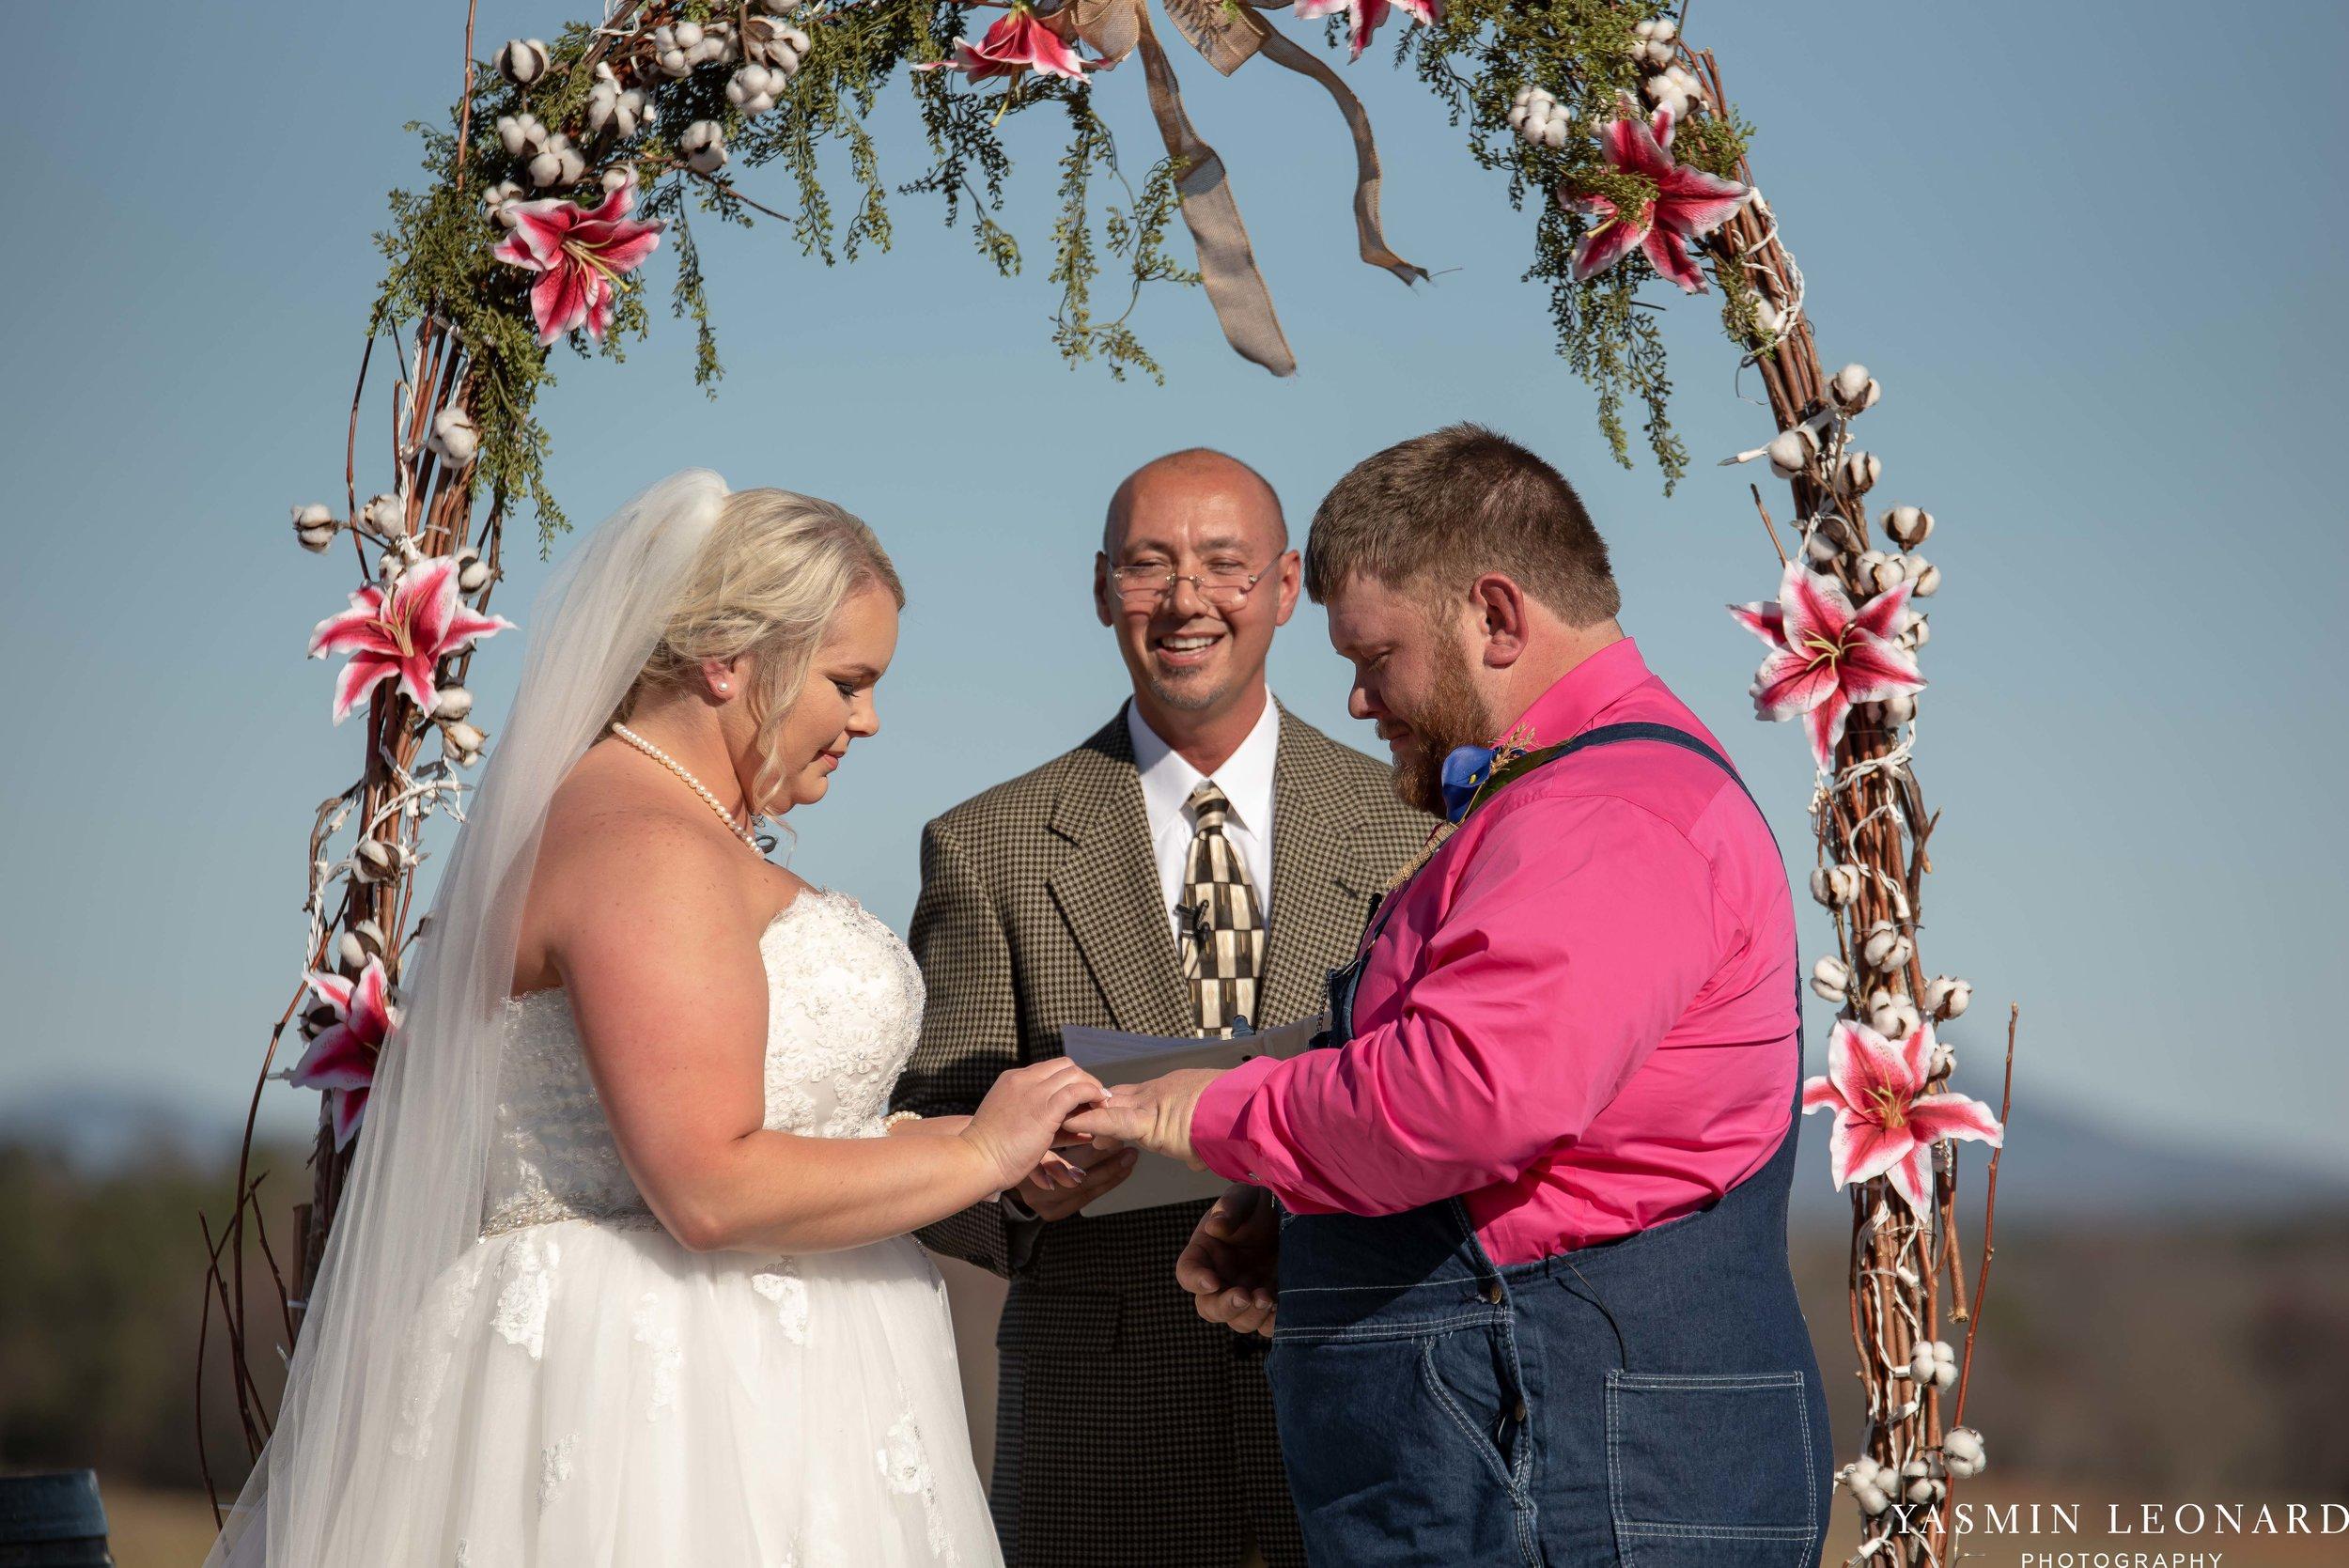 The Barn at Heritage Farm - Country Wedding - Pink and Blue Wedding - Barn Wedding - Outdoor Wedding - Cotton and Wheat Decor - Groom in Bibs - Pink Bridal Colors - Yasmin Leonard Photography-13.jpg